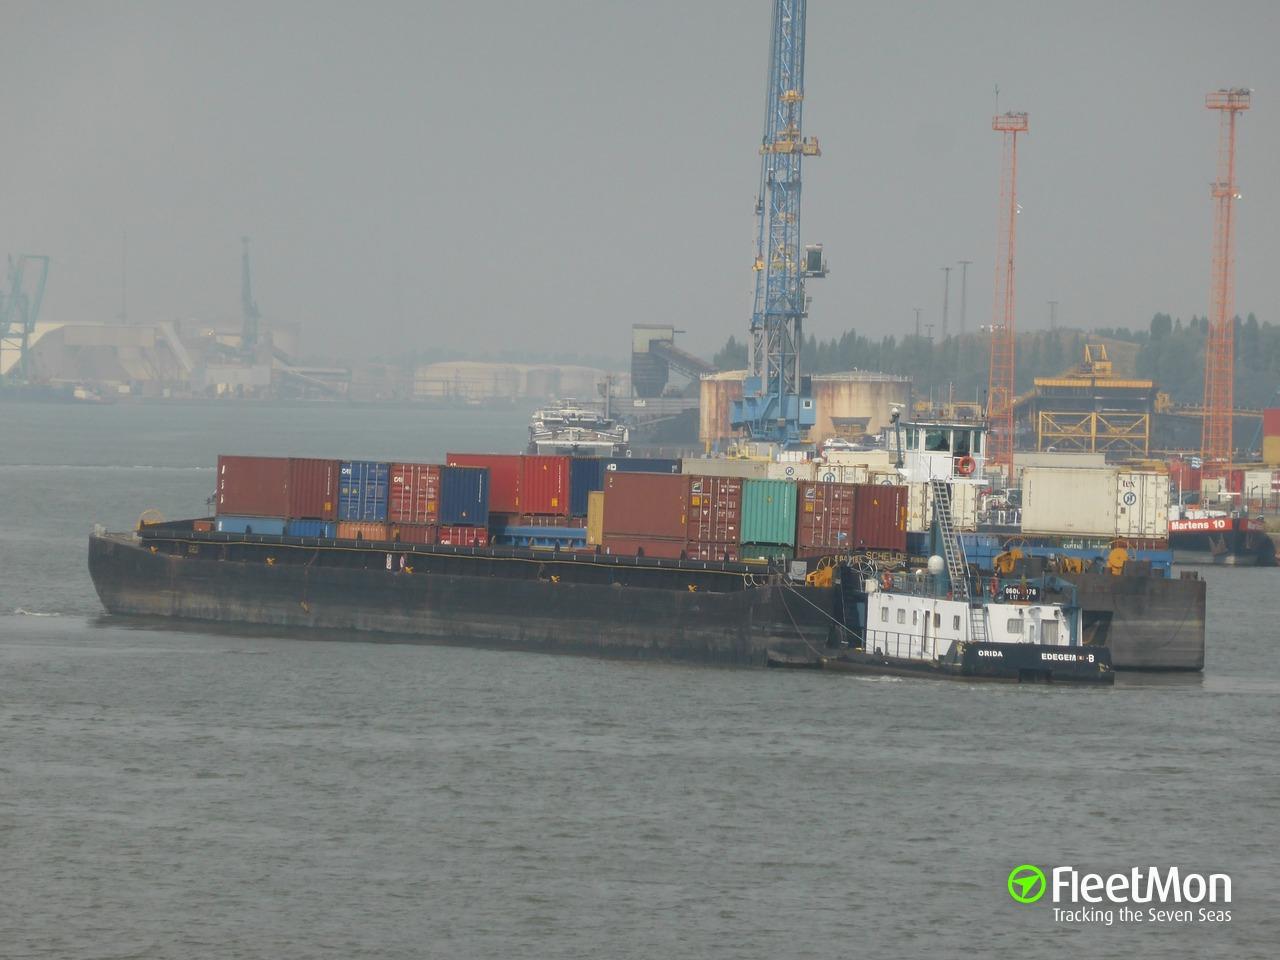 Vessel ORIDA (Cargo ship) IMO 1081344, MMSI 205505090